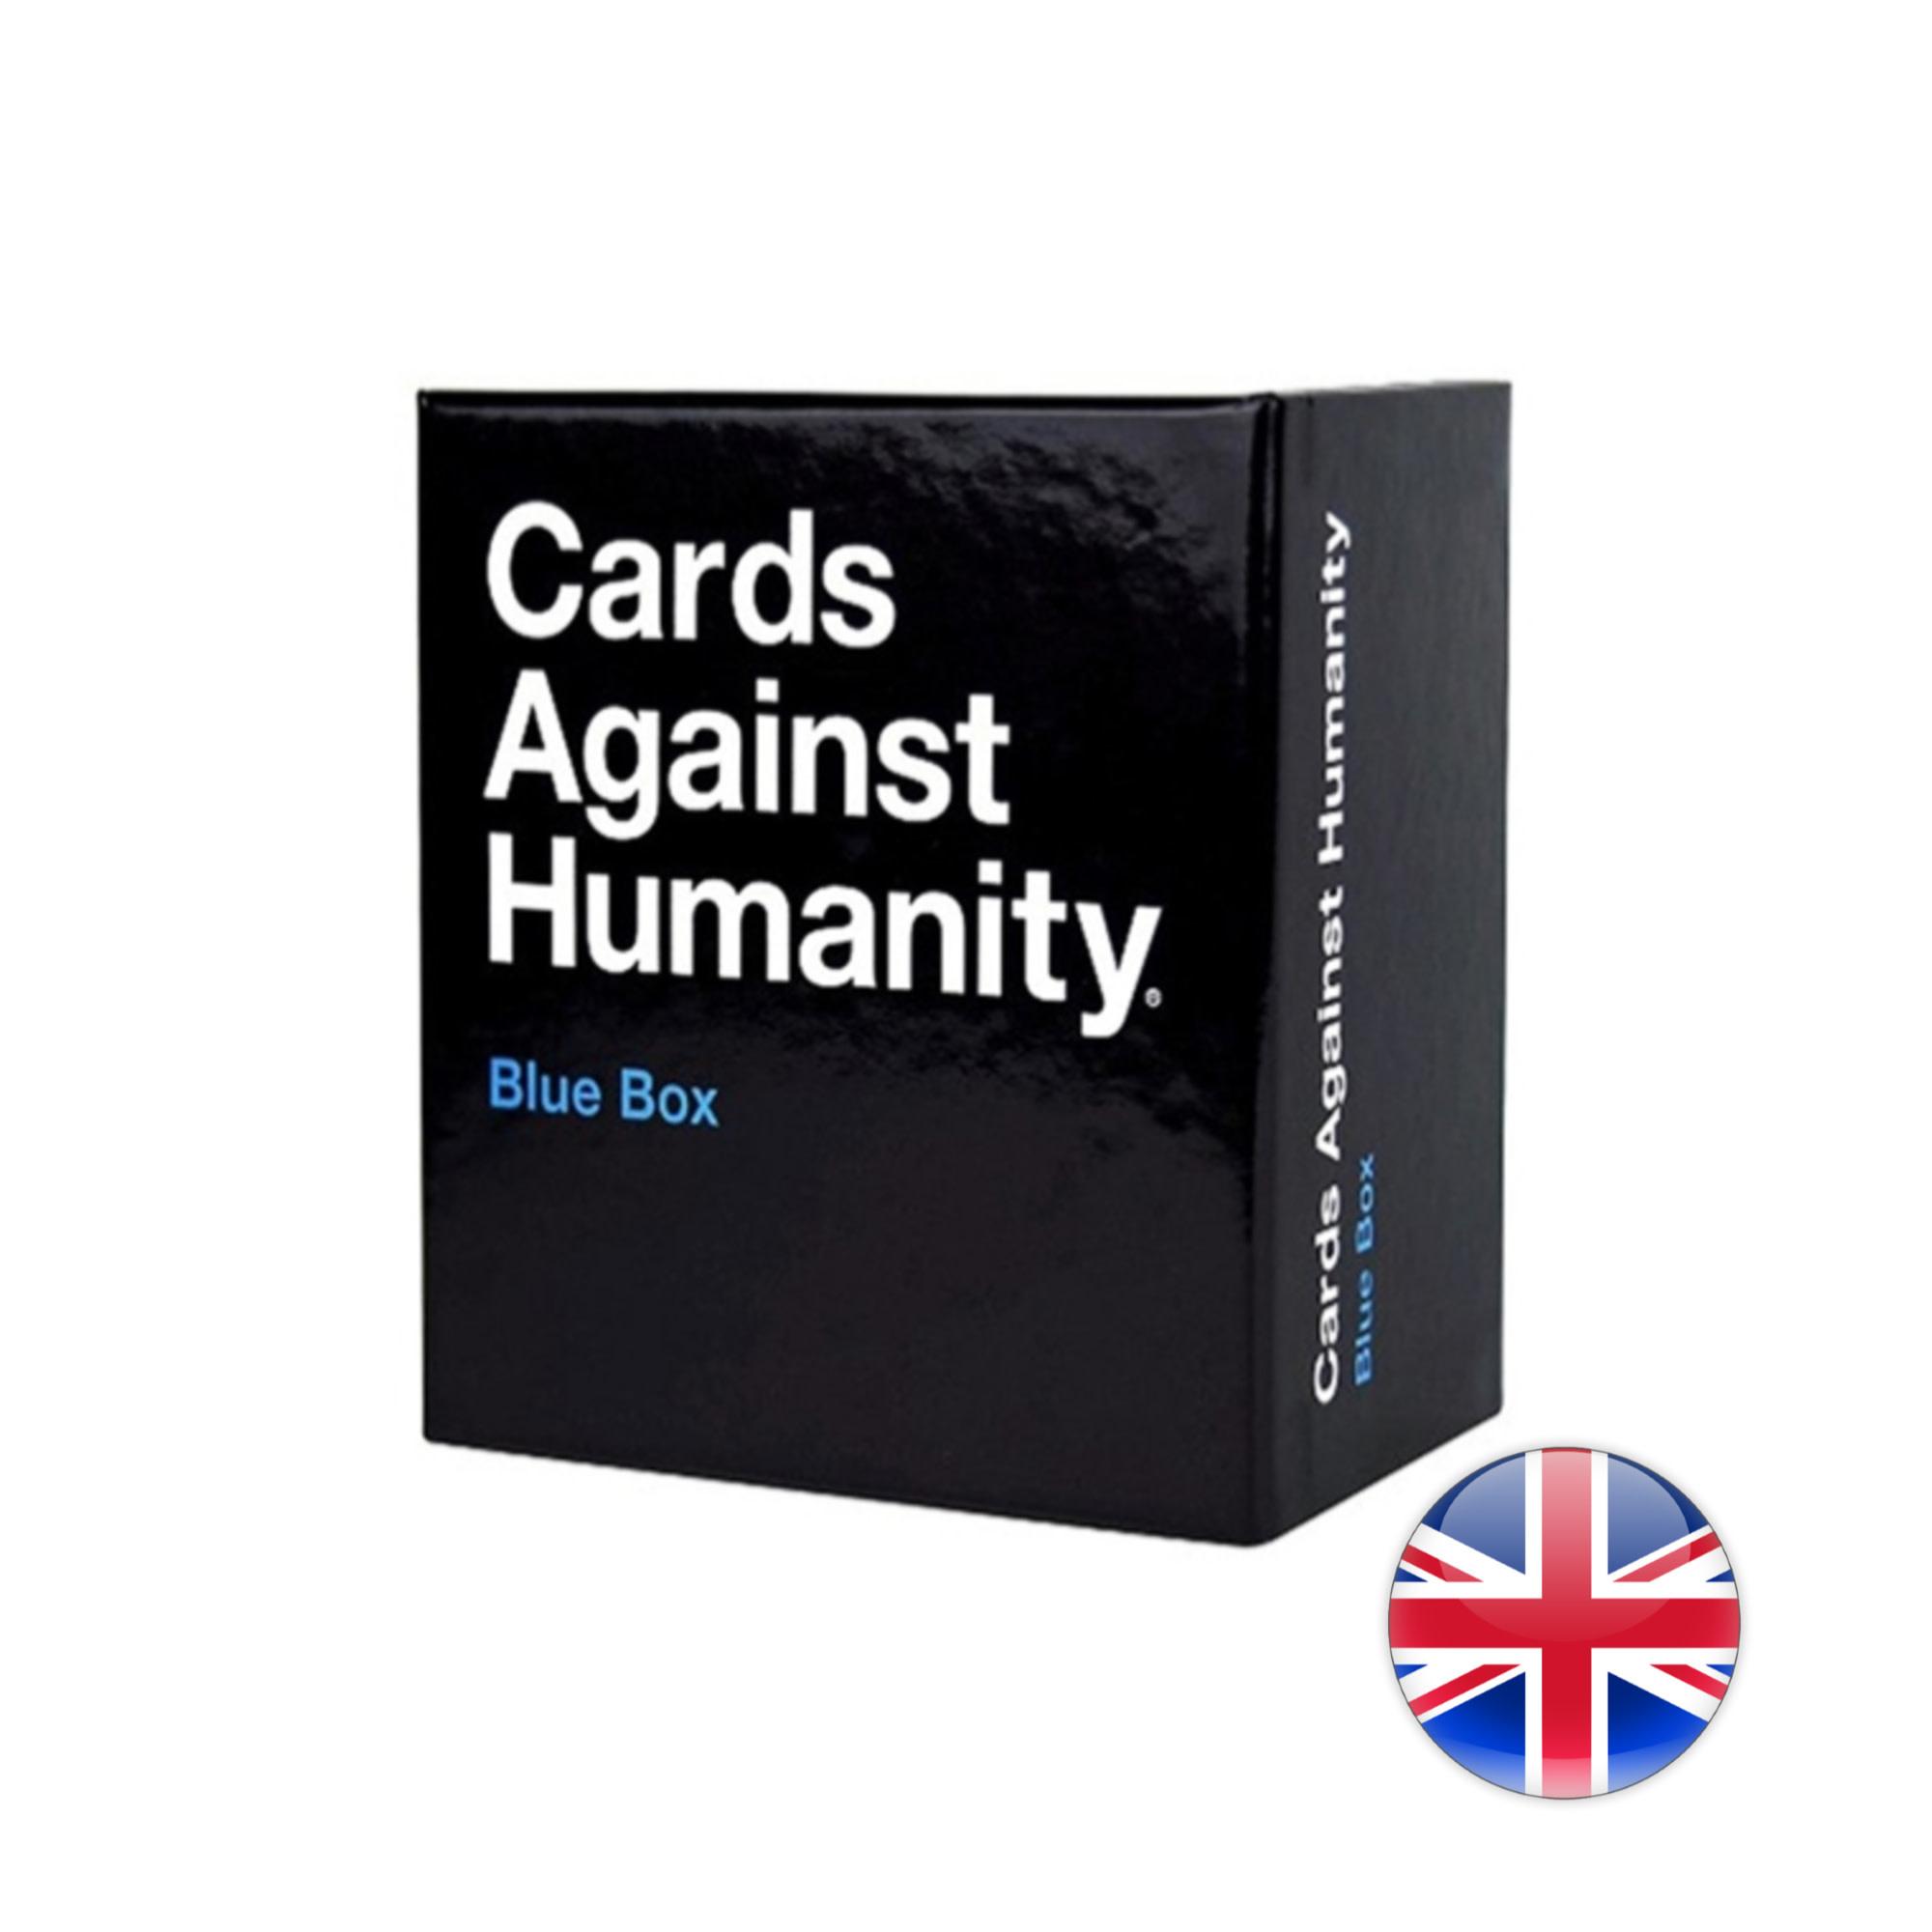 Cards against humanity Cards Against Humanity Blue